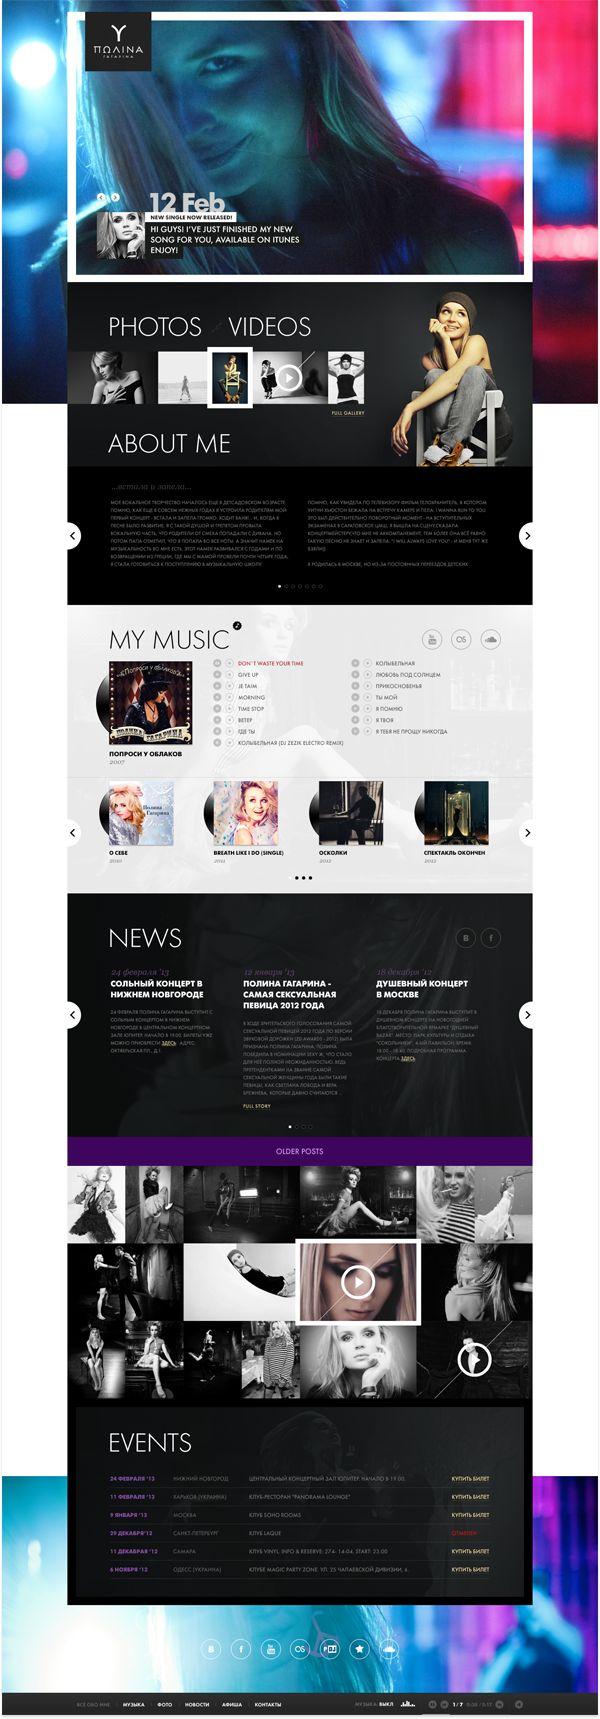 #webdesign | #webdesign #it #web #design #layout #userinterface #website #webdesign <<< repinned by an #advertising #agency from #Hamburg / #Germany - www.BlickeDeeler.de | Follow us on www.facebook.com/BlickeDeeler